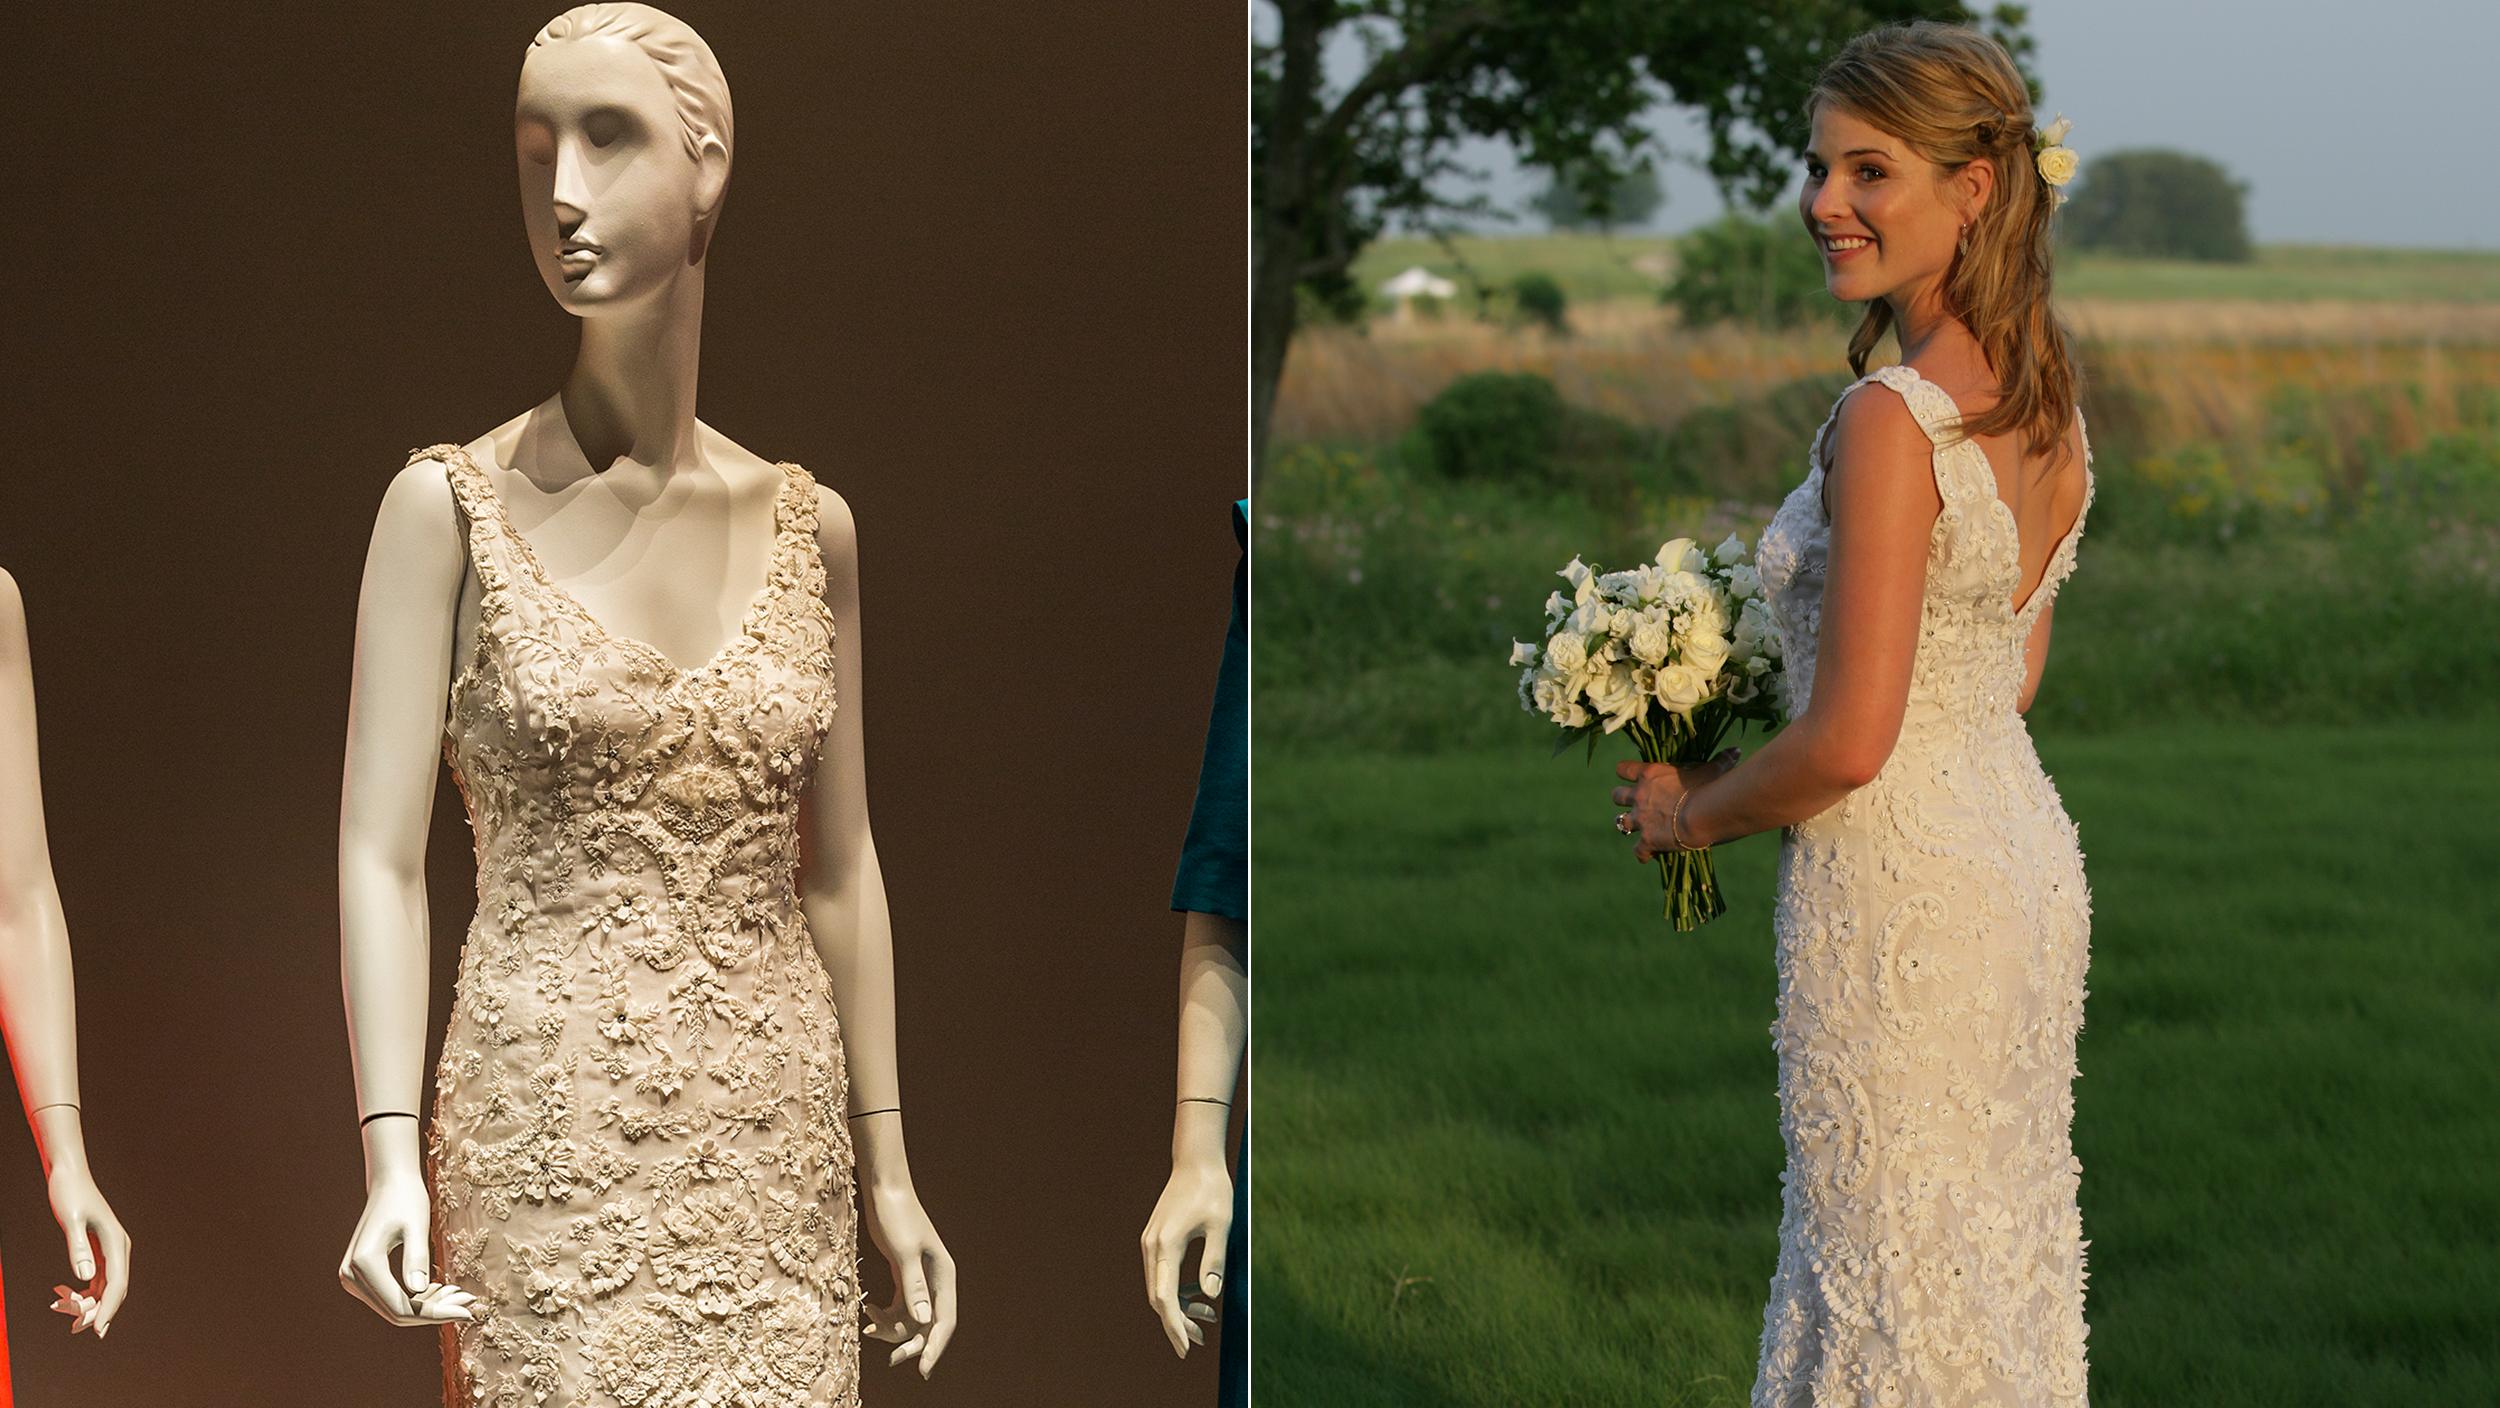 Jenna Bush Hager's wedding gown on display at Oscar de la Renta ...